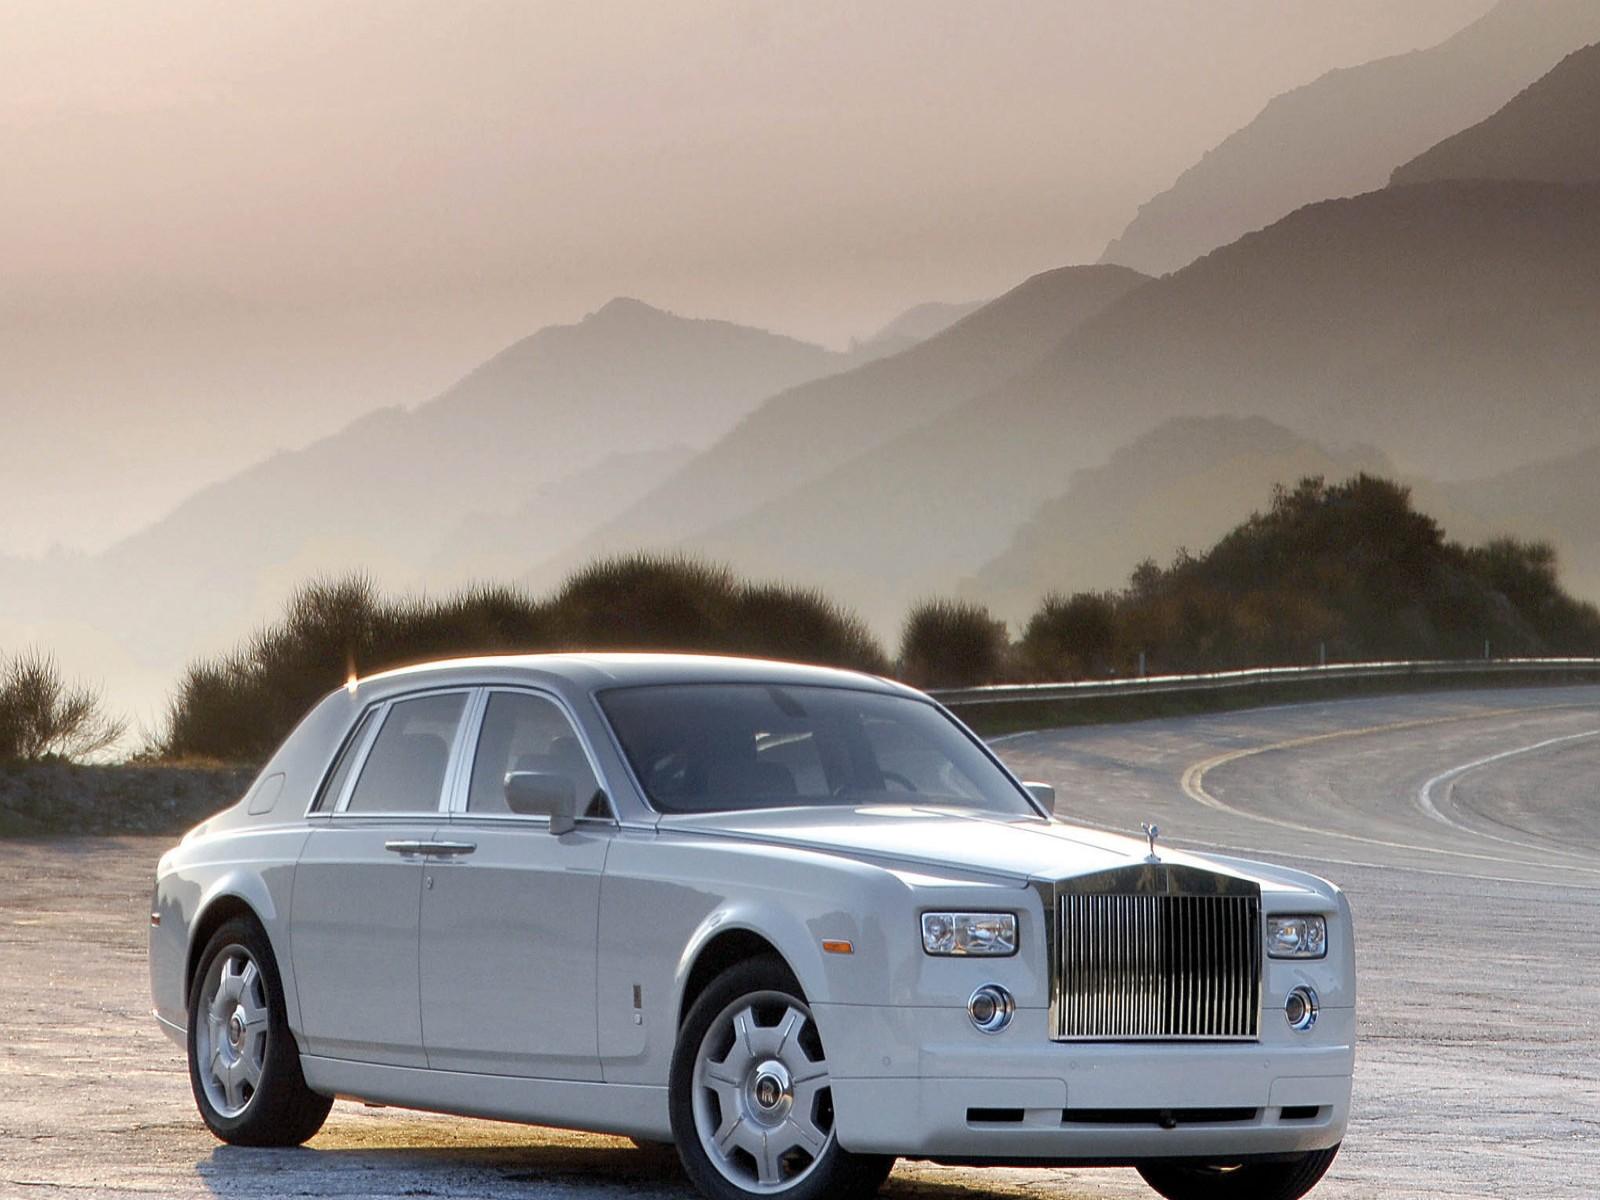 Rolls Royce HD wallpapers Free Download